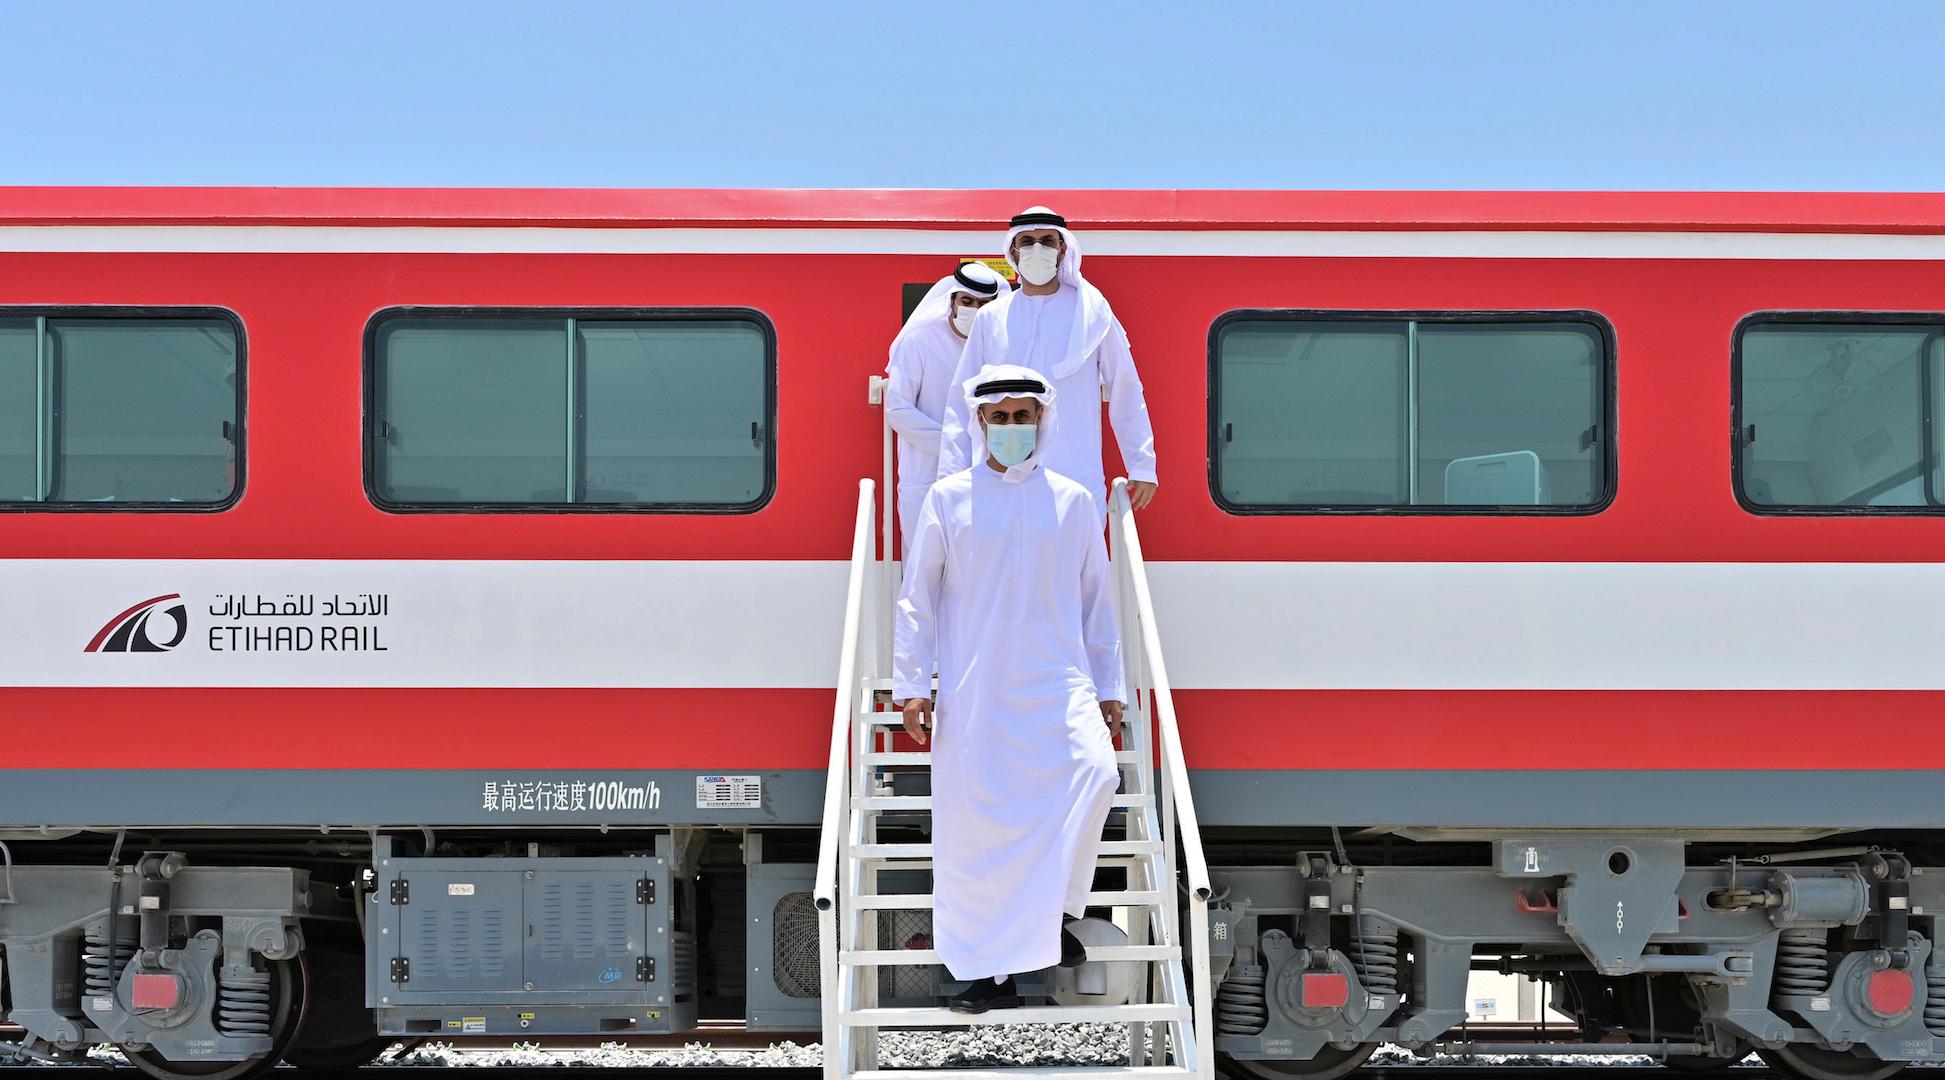 Sheikh Theyab inaugurates track-laying works at Seih Shuaib site